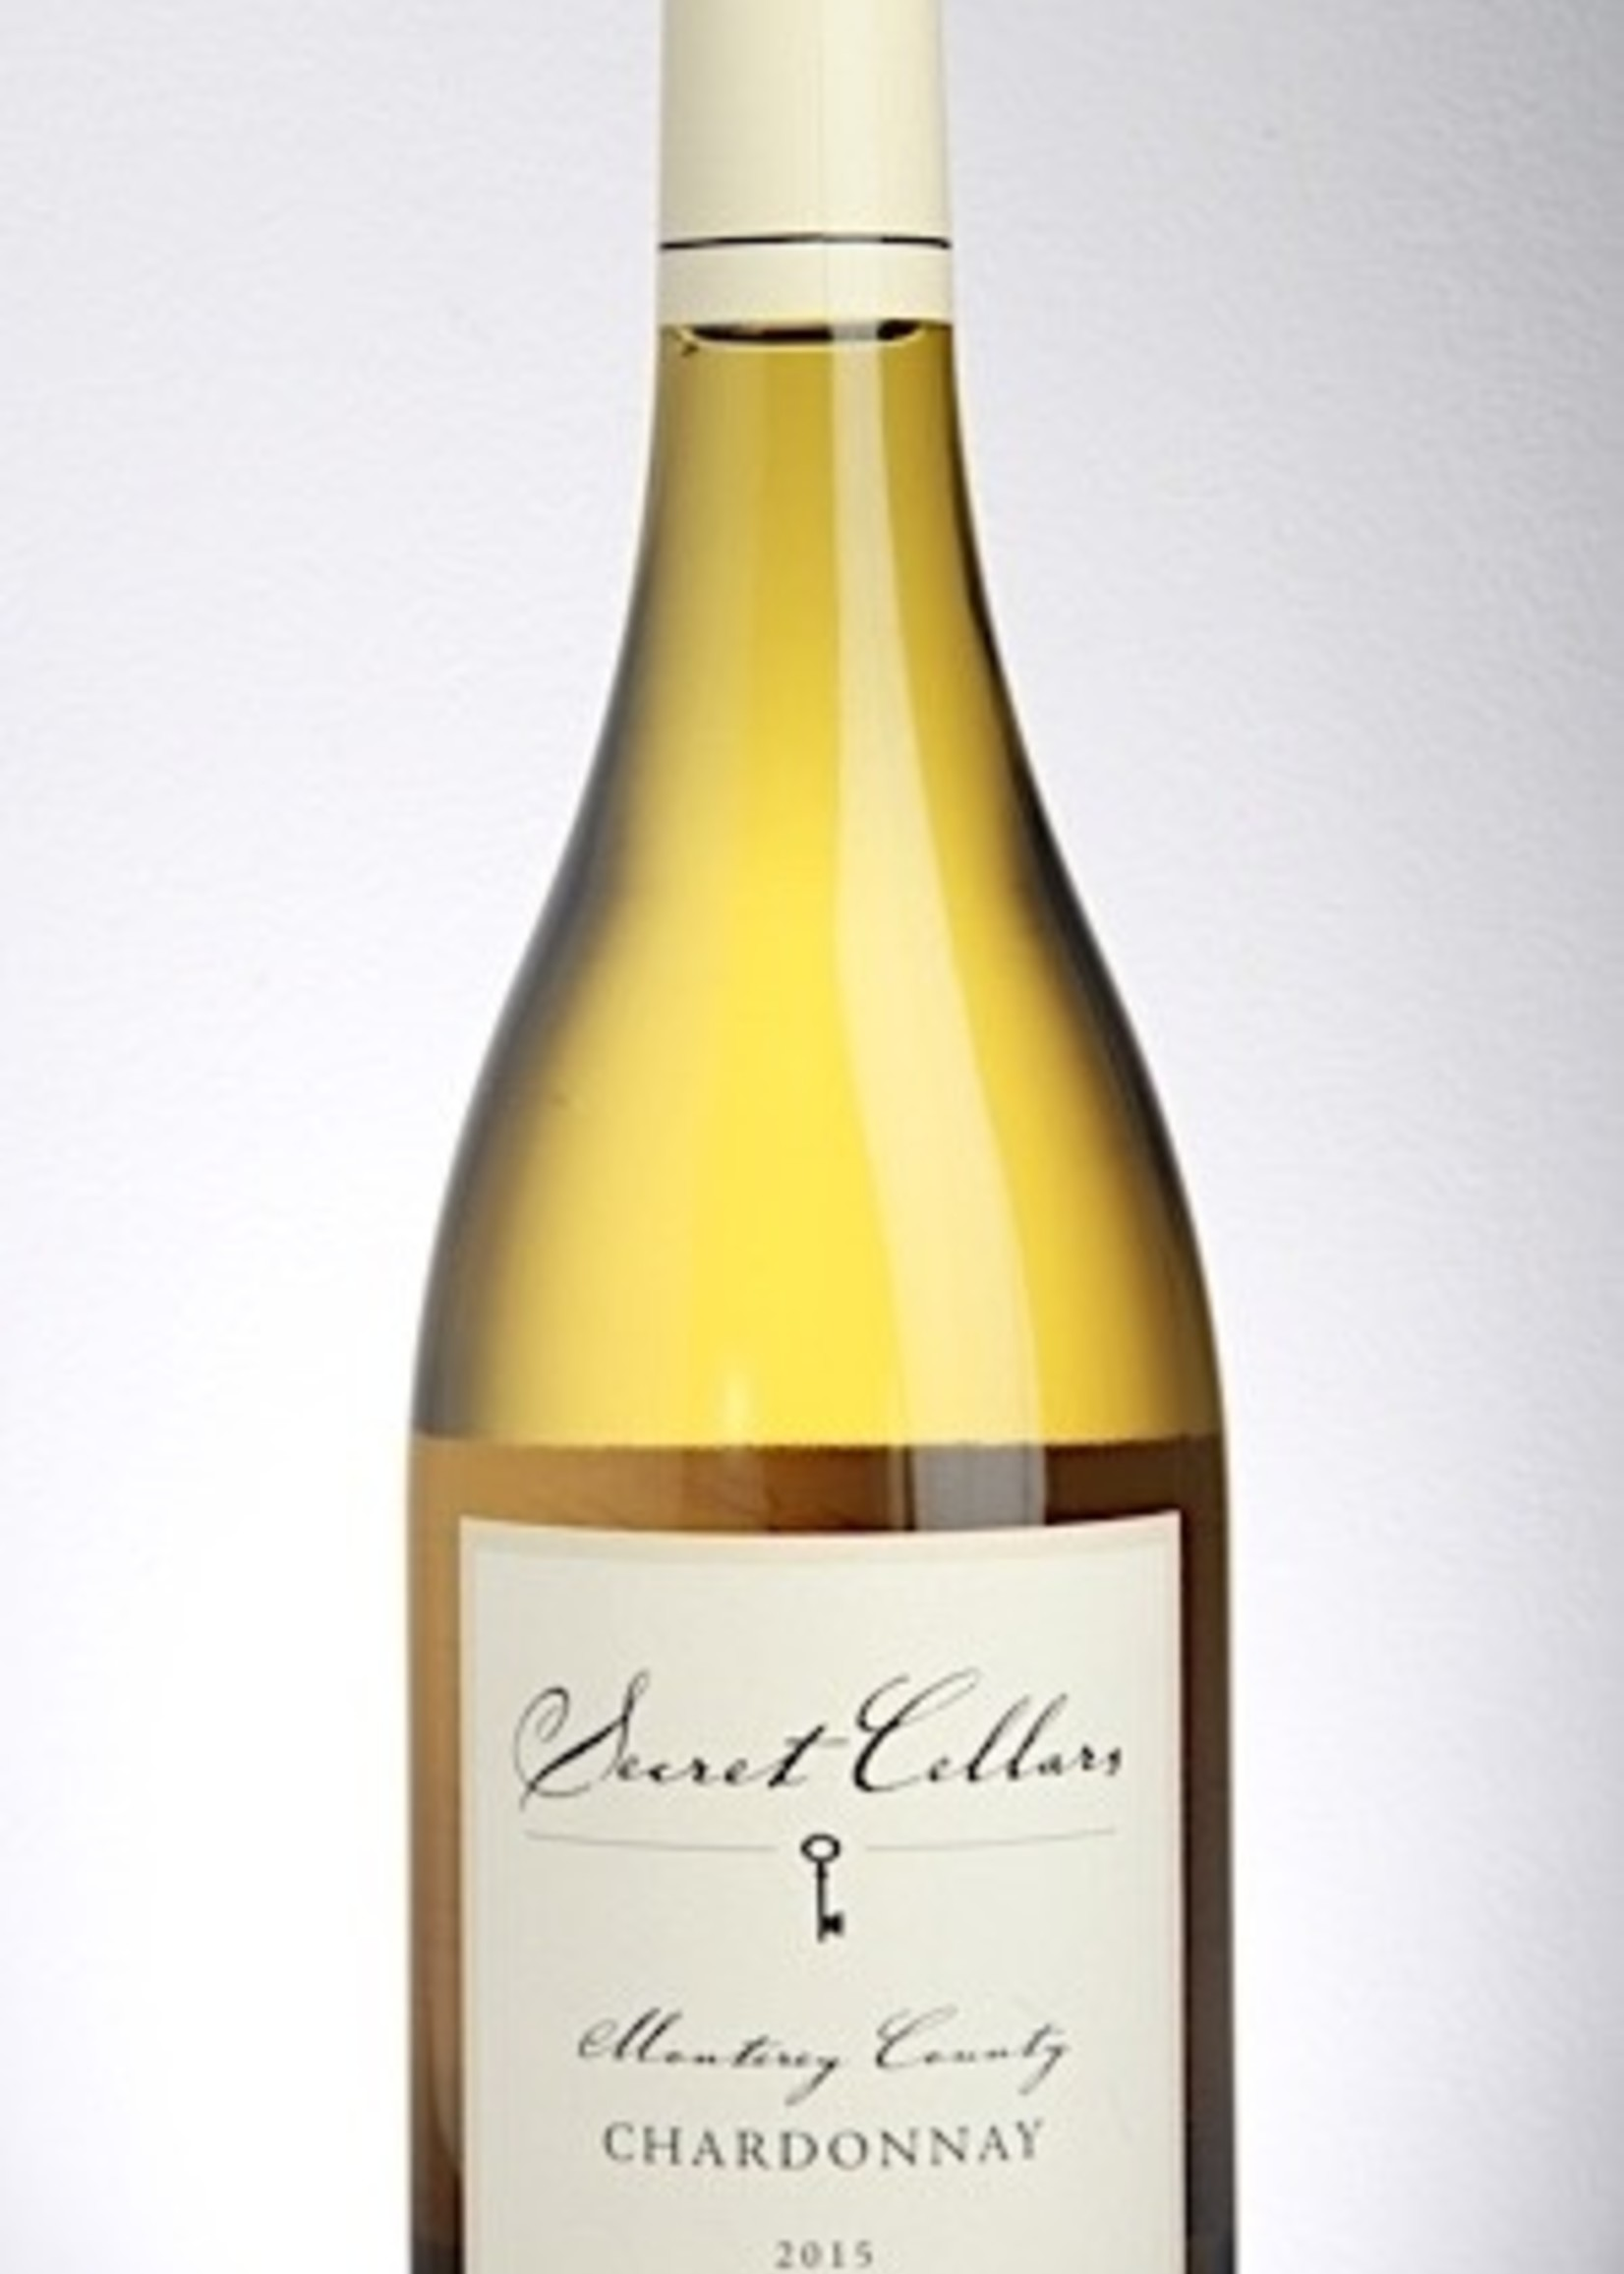 Secret Cellars Chardonnay